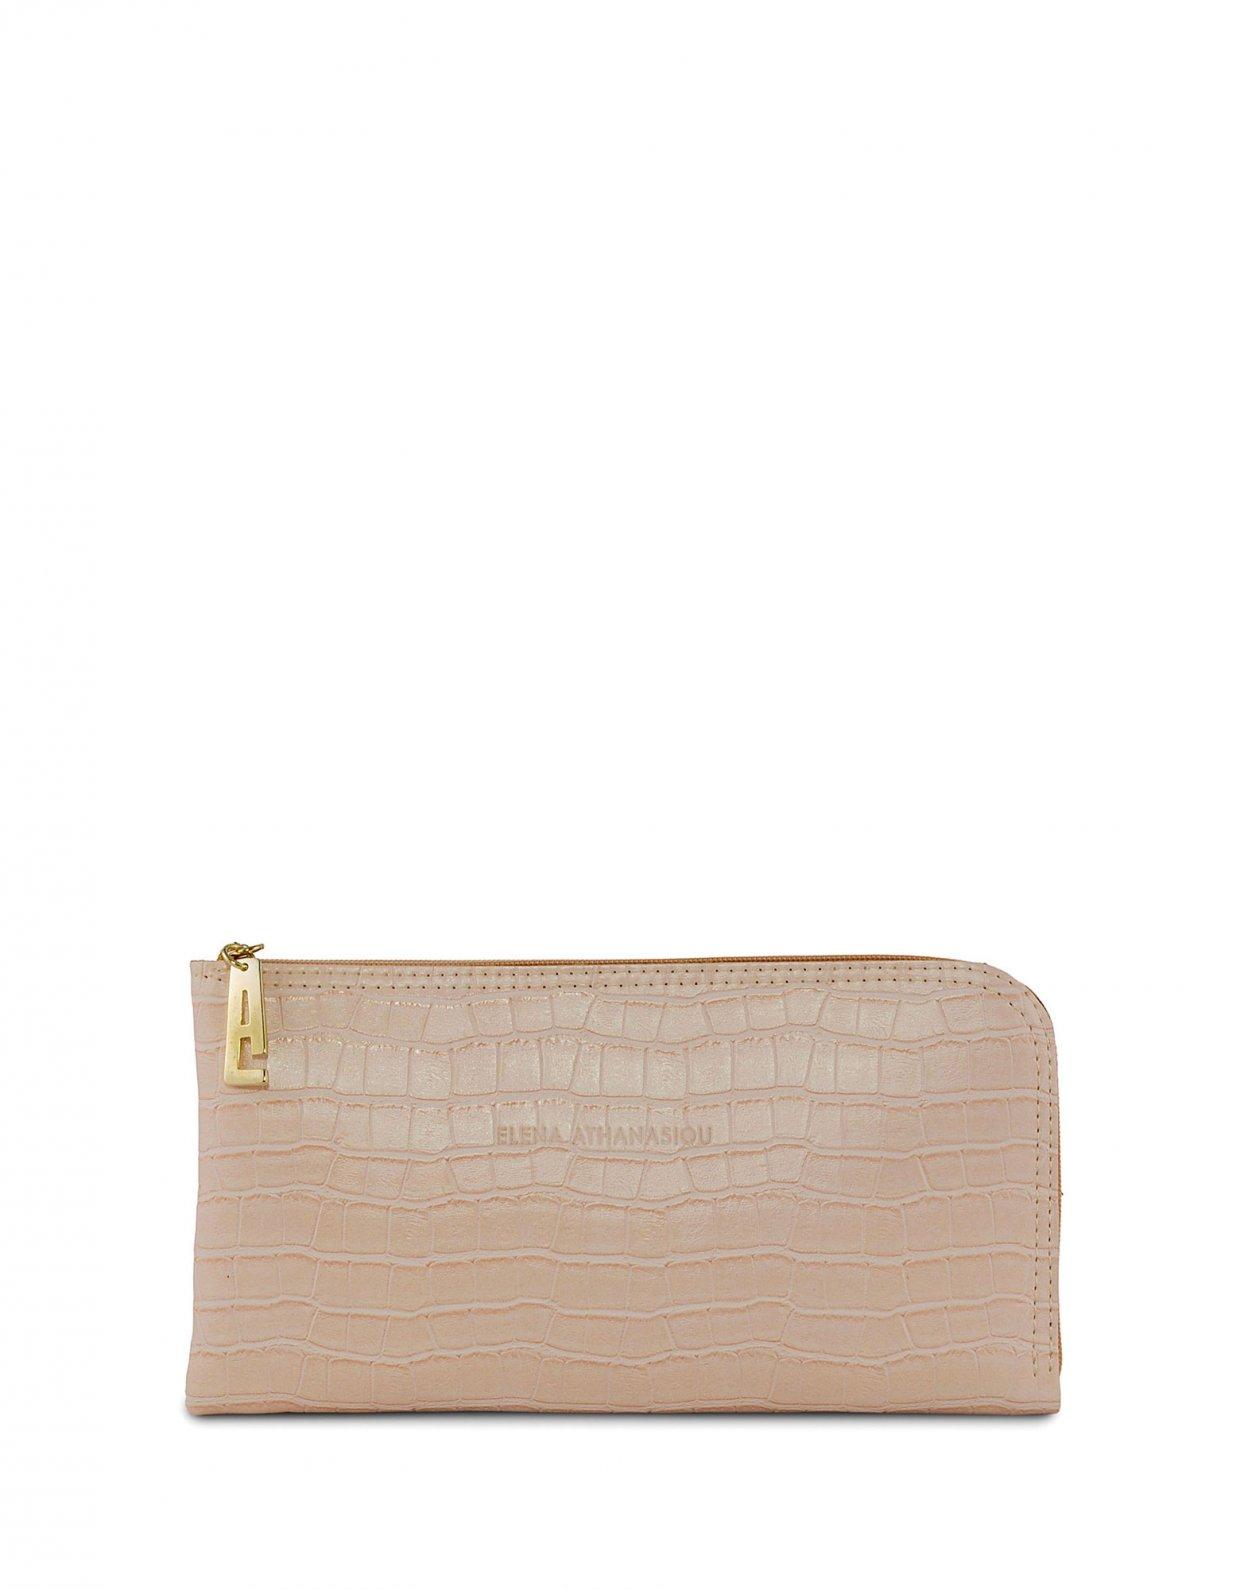 Elena Athanasiou Mini clutch bag powder pink croco